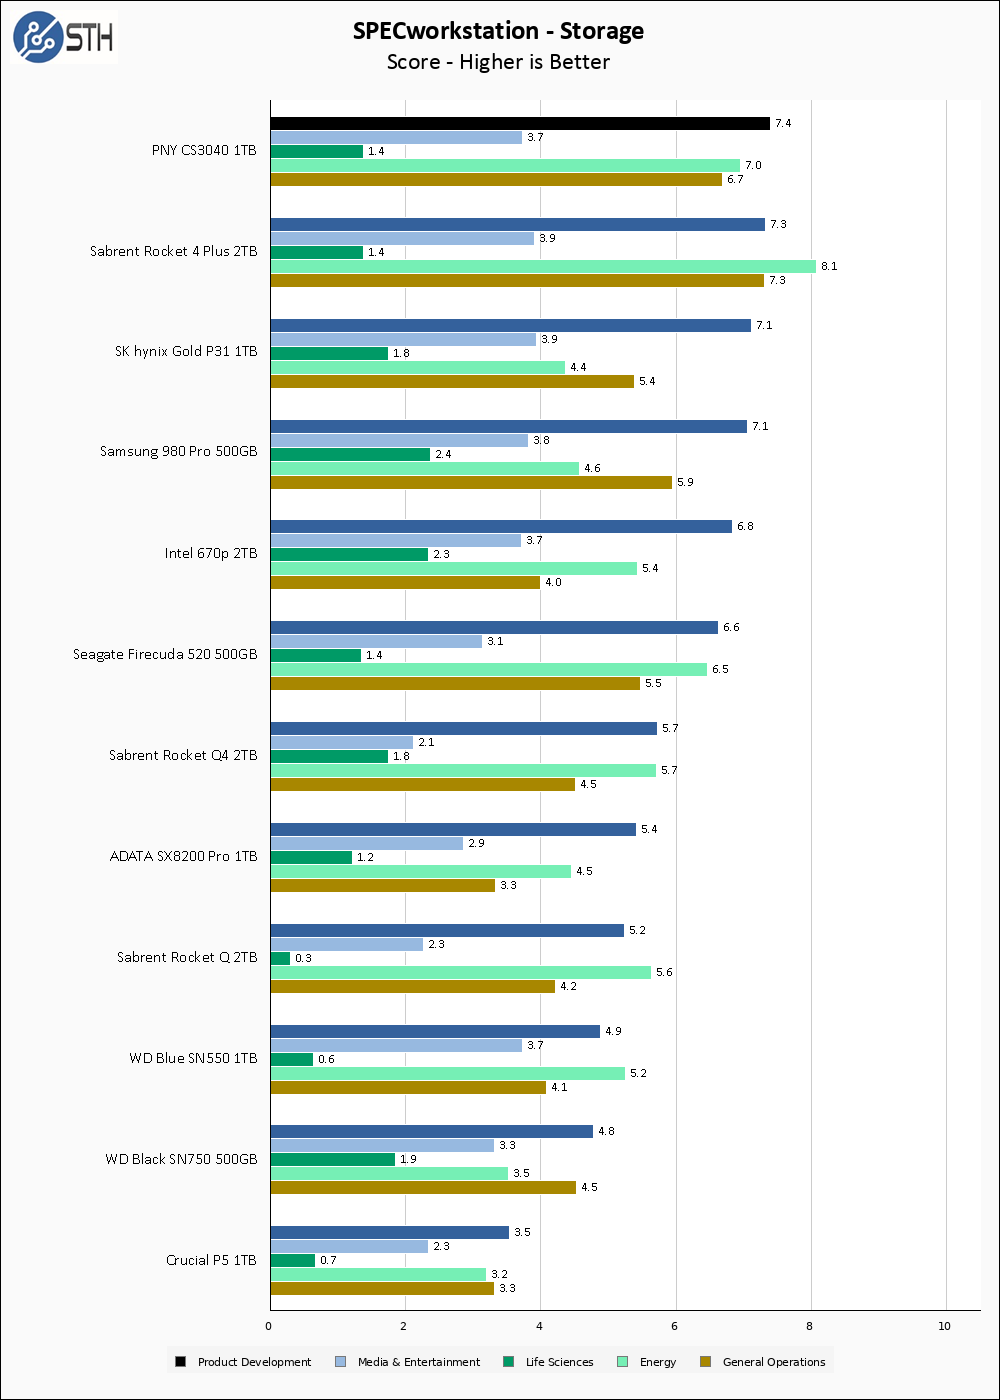 PNY CS3040 1TB SPECws Chart